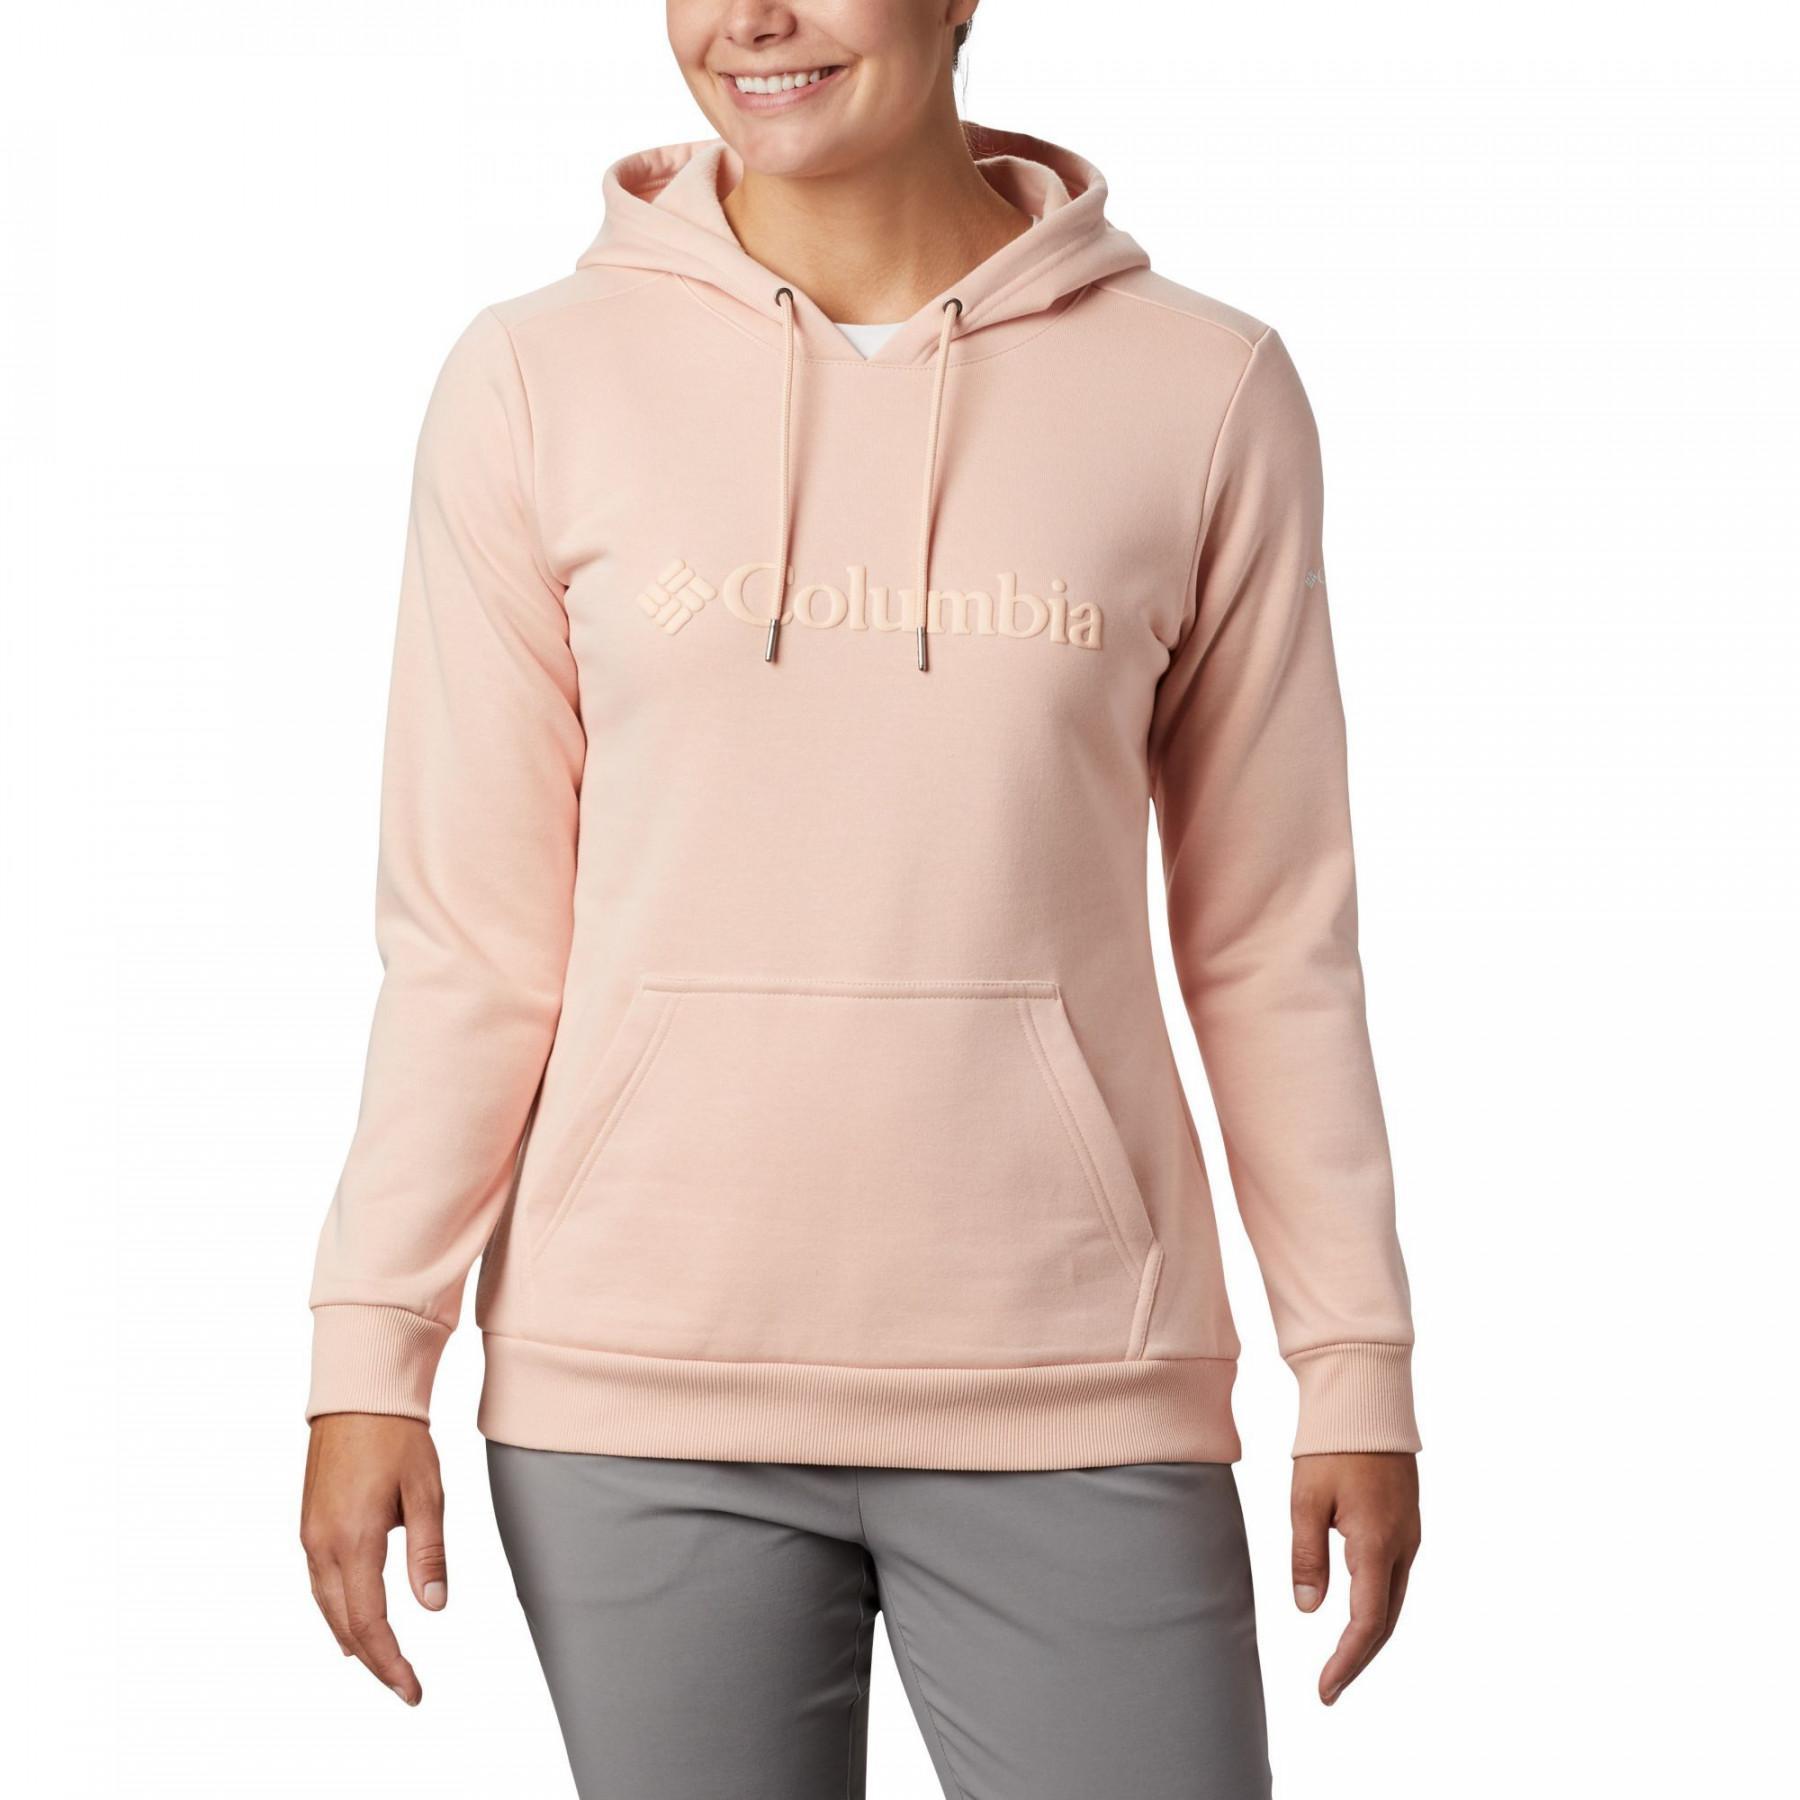 Columbia Sweatshirt /à Capuche avec Logo Femme